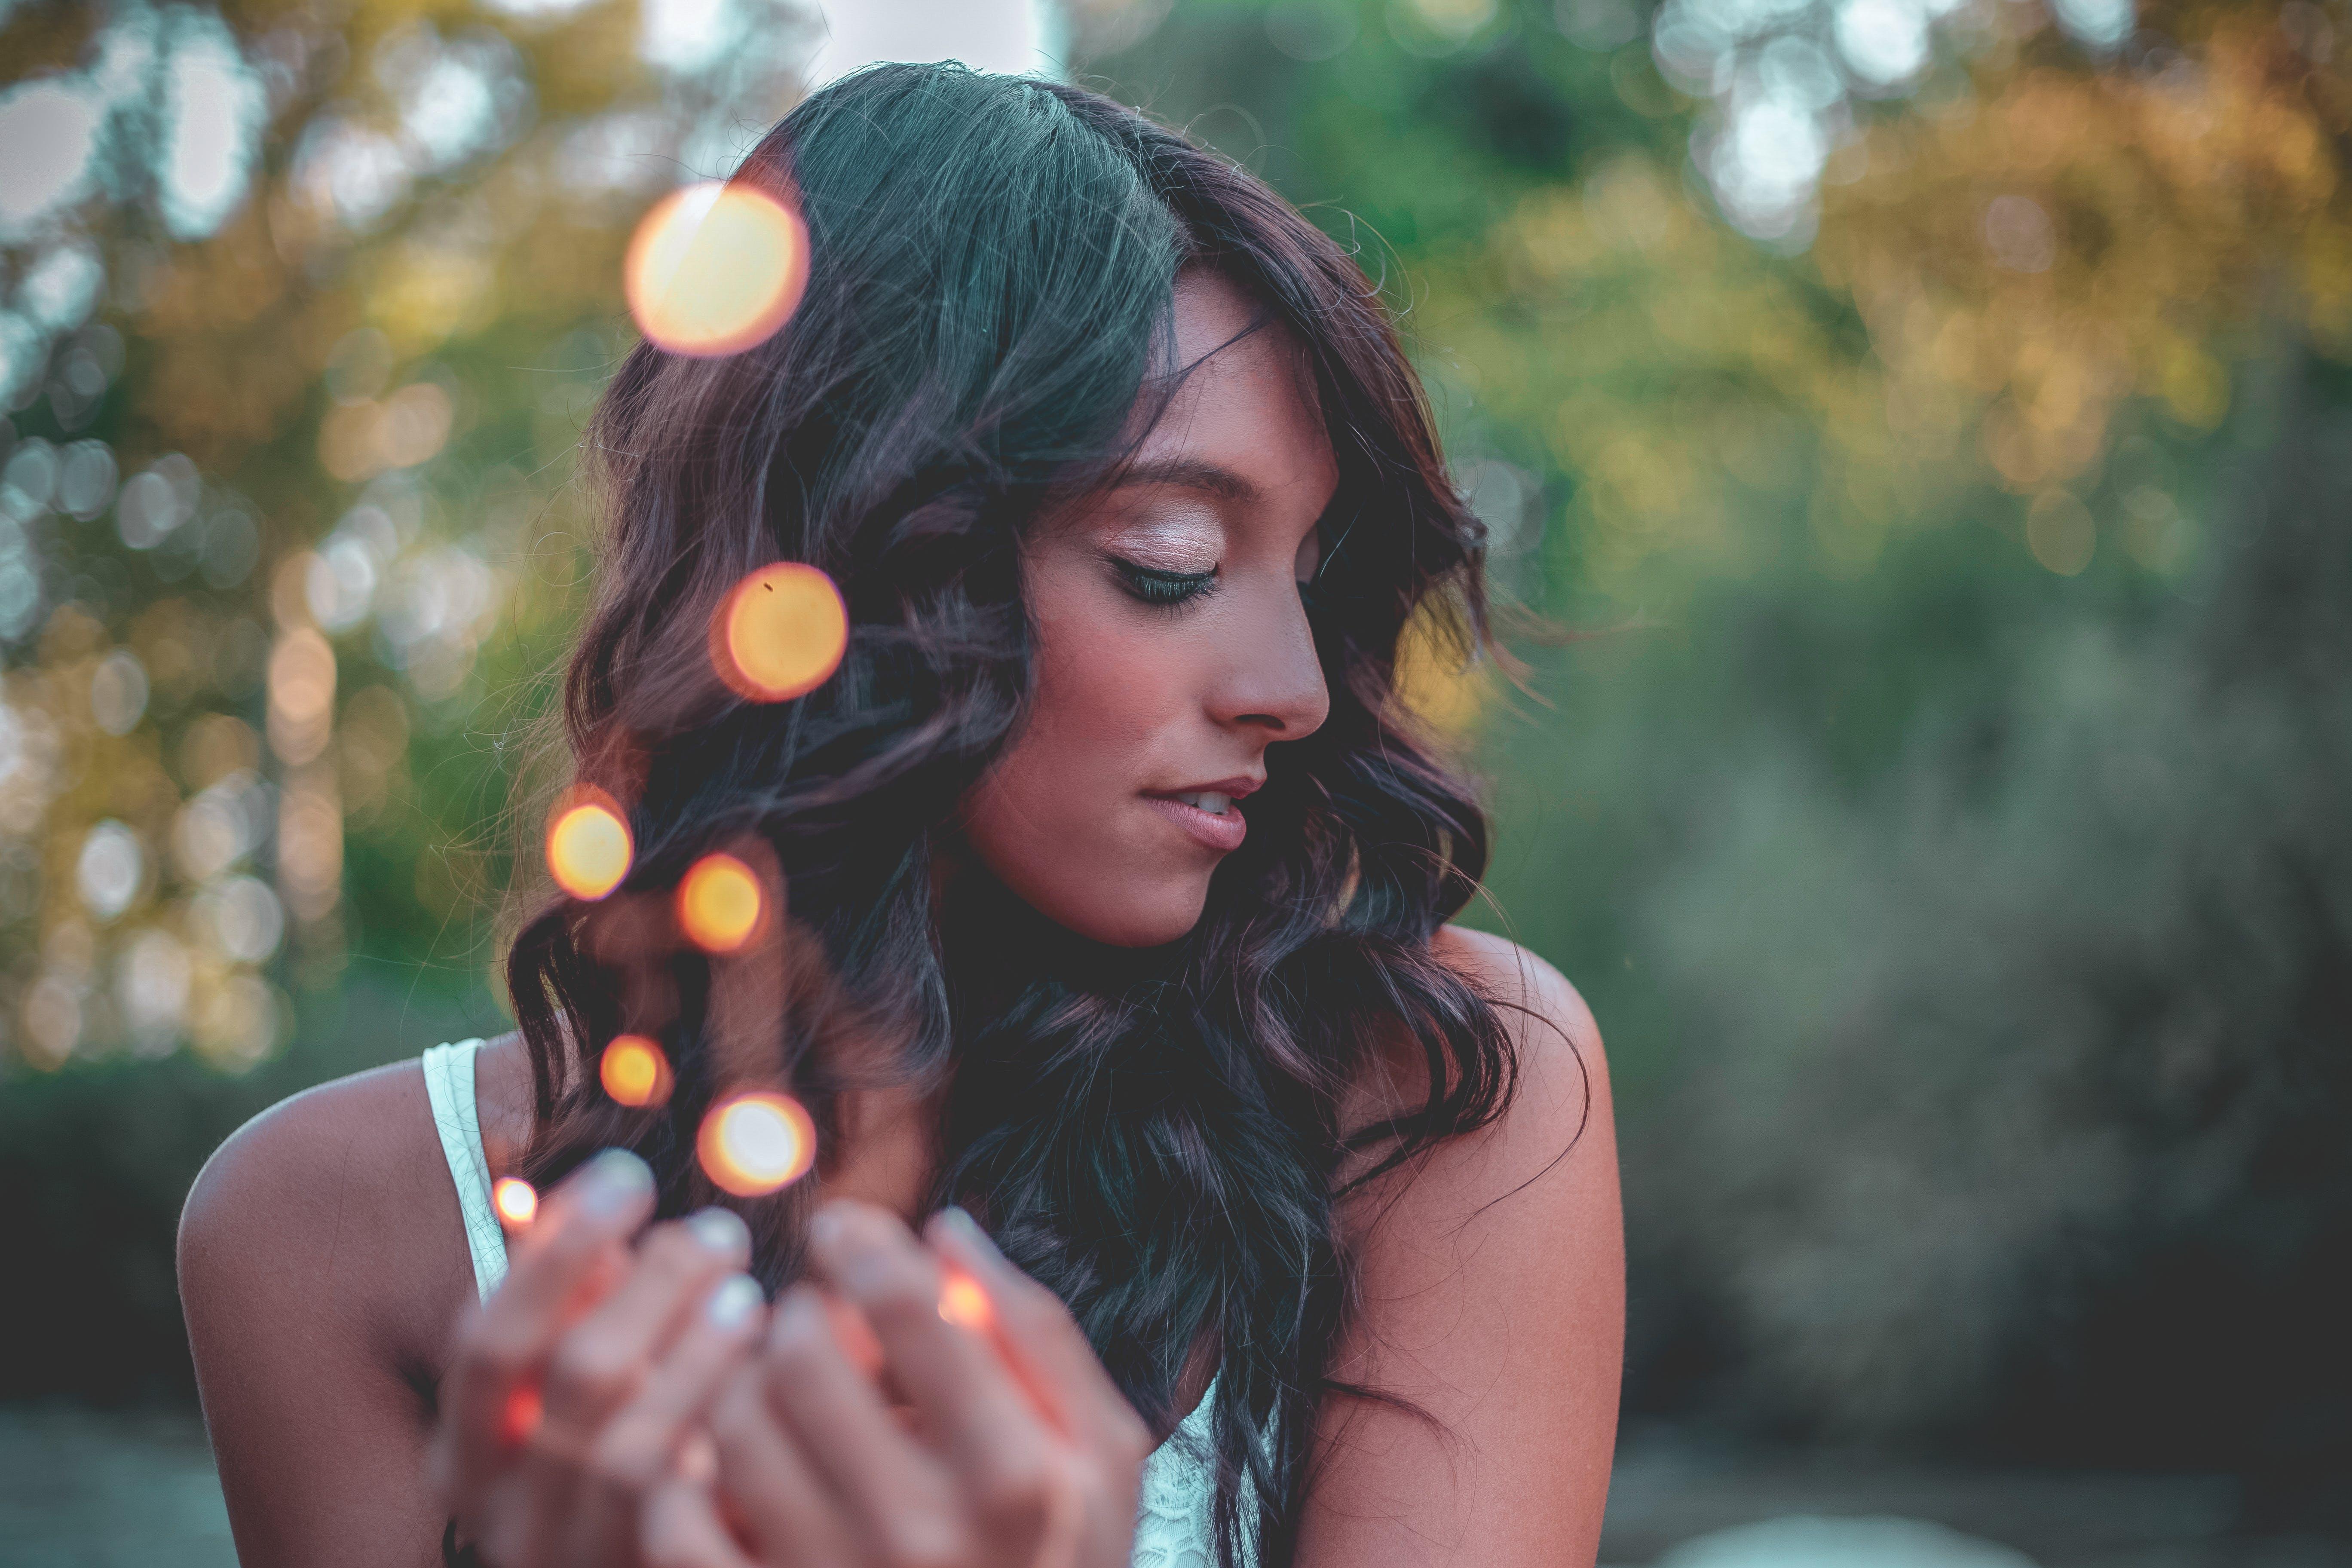 Closeup Photography of Woman Wearing White Spaghetti Strap Top